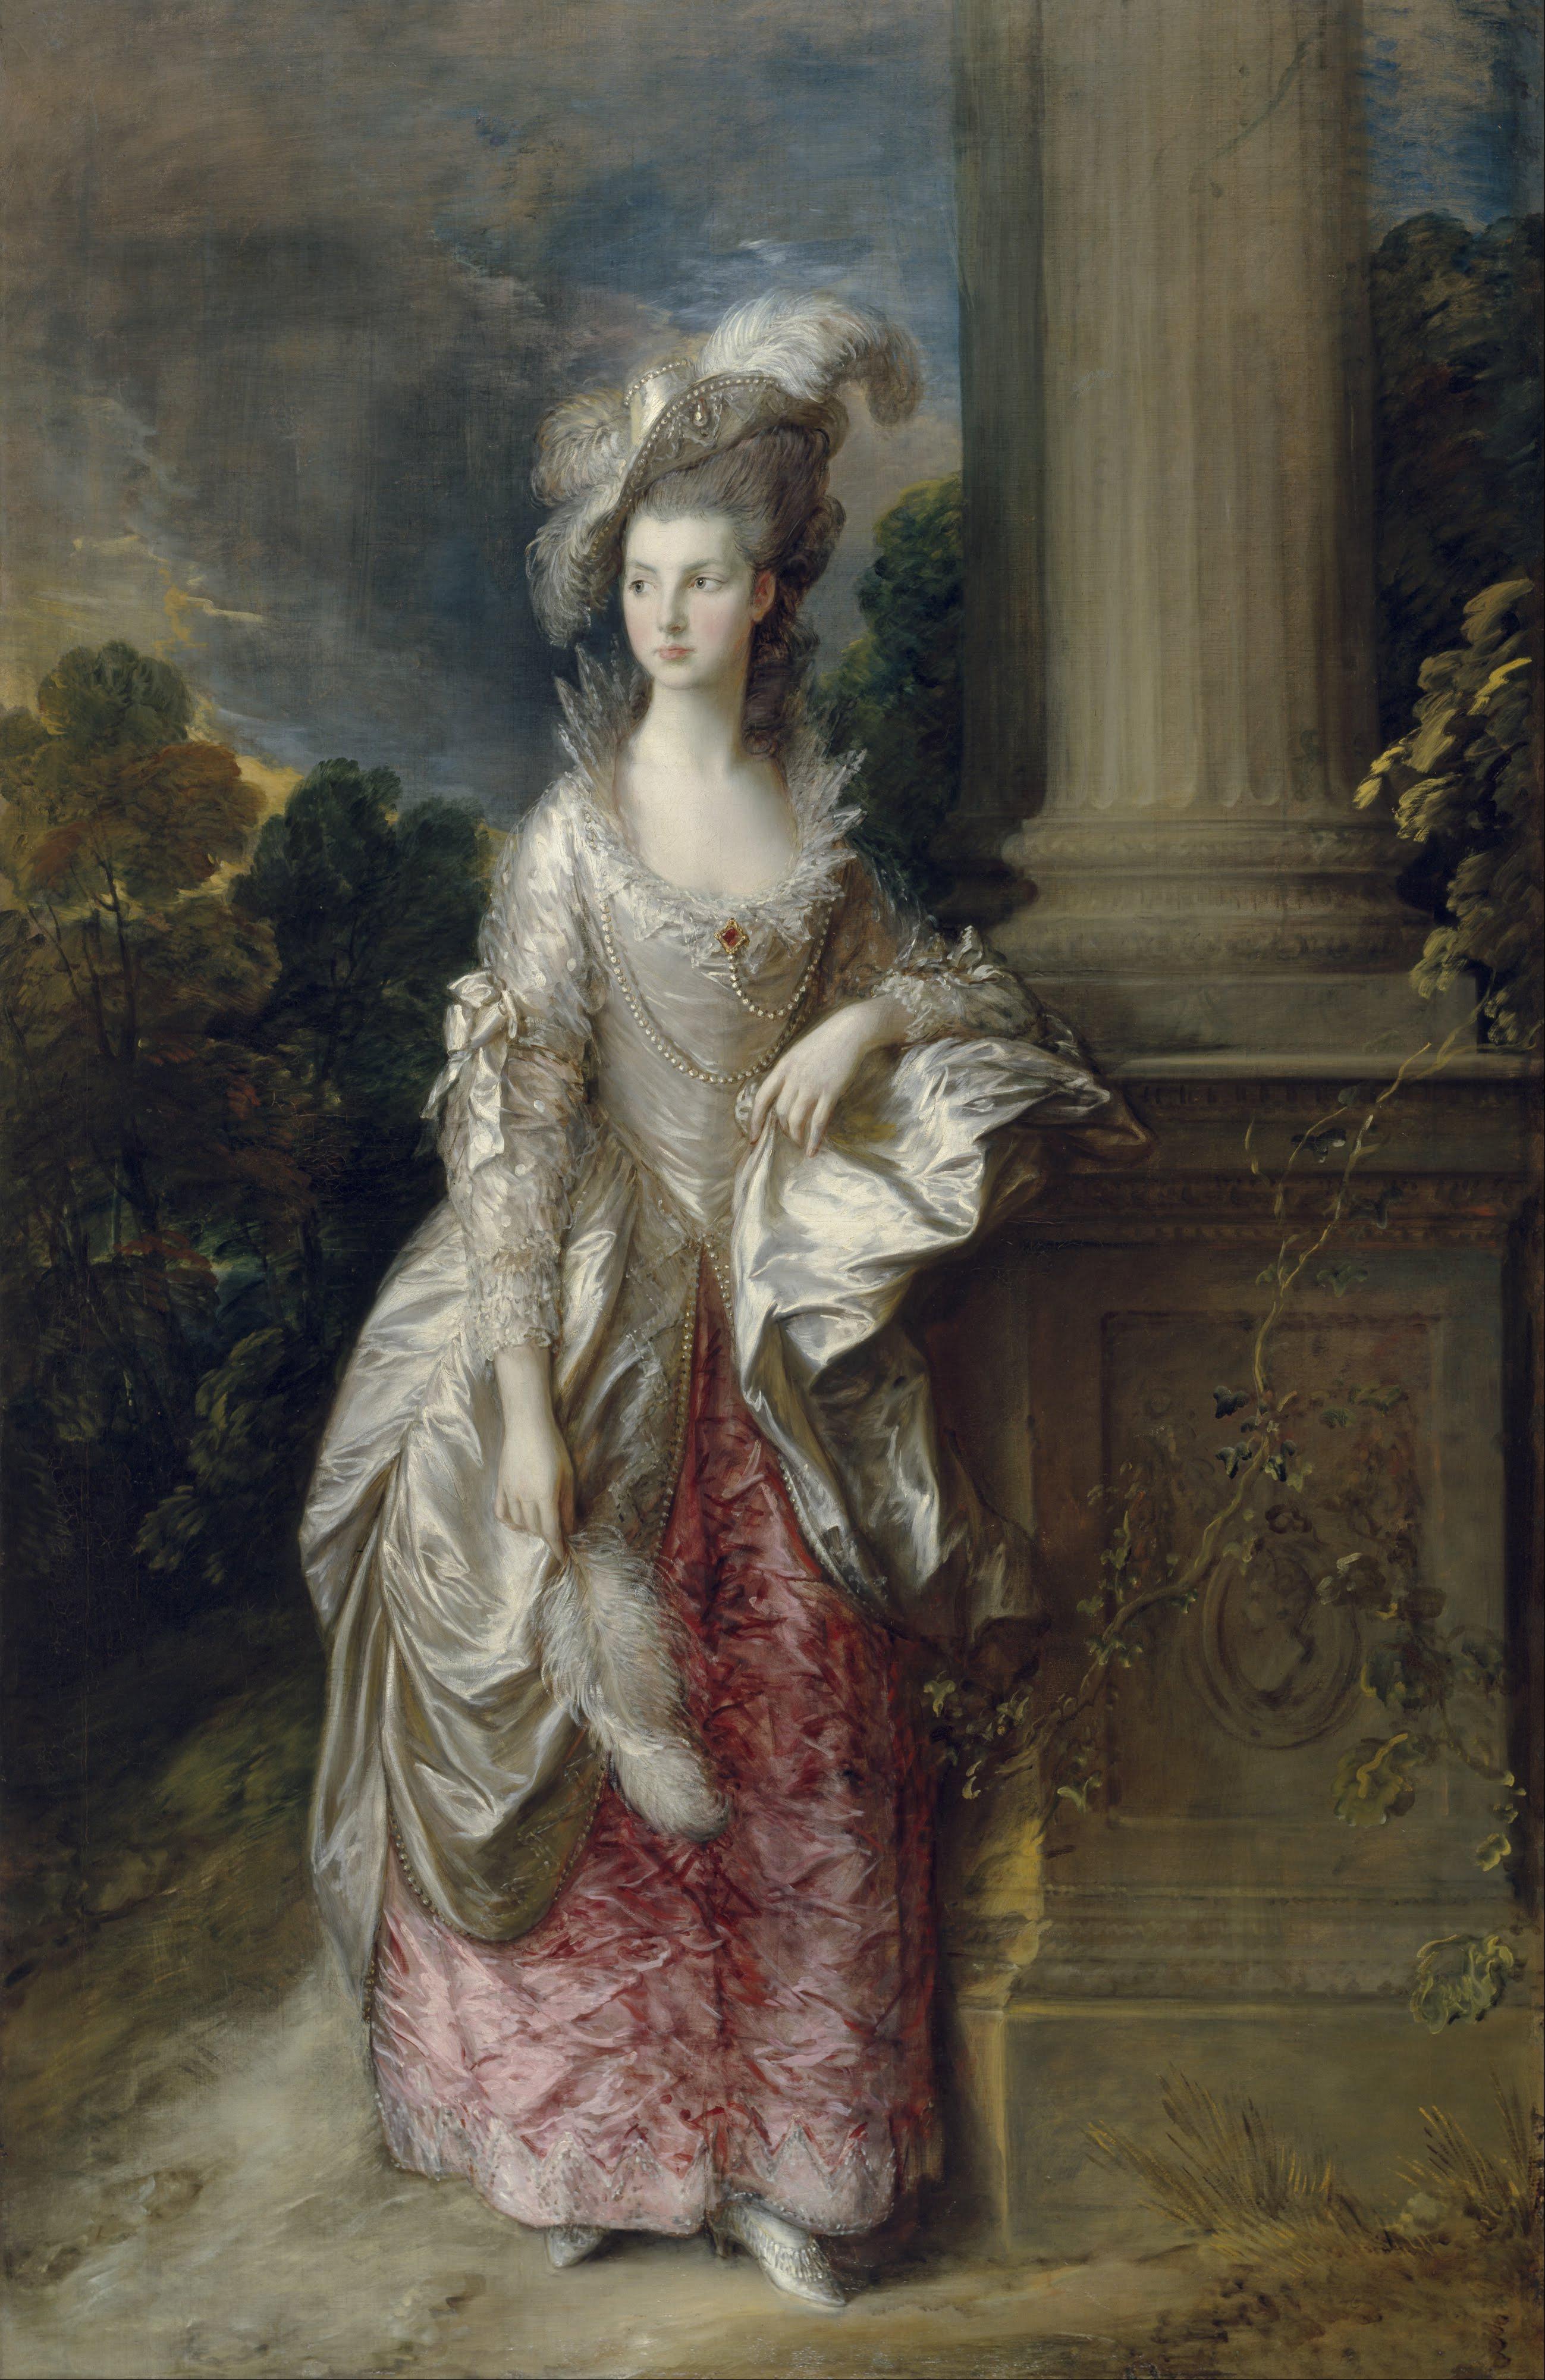 https://upload.wikimedia.org/wikipedia/commons/7/7d/Thomas_Gainsborough_-_The_Honourable_Mrs_Graham_%281757_-_1792%29_-_Google_Art_Project.jpg